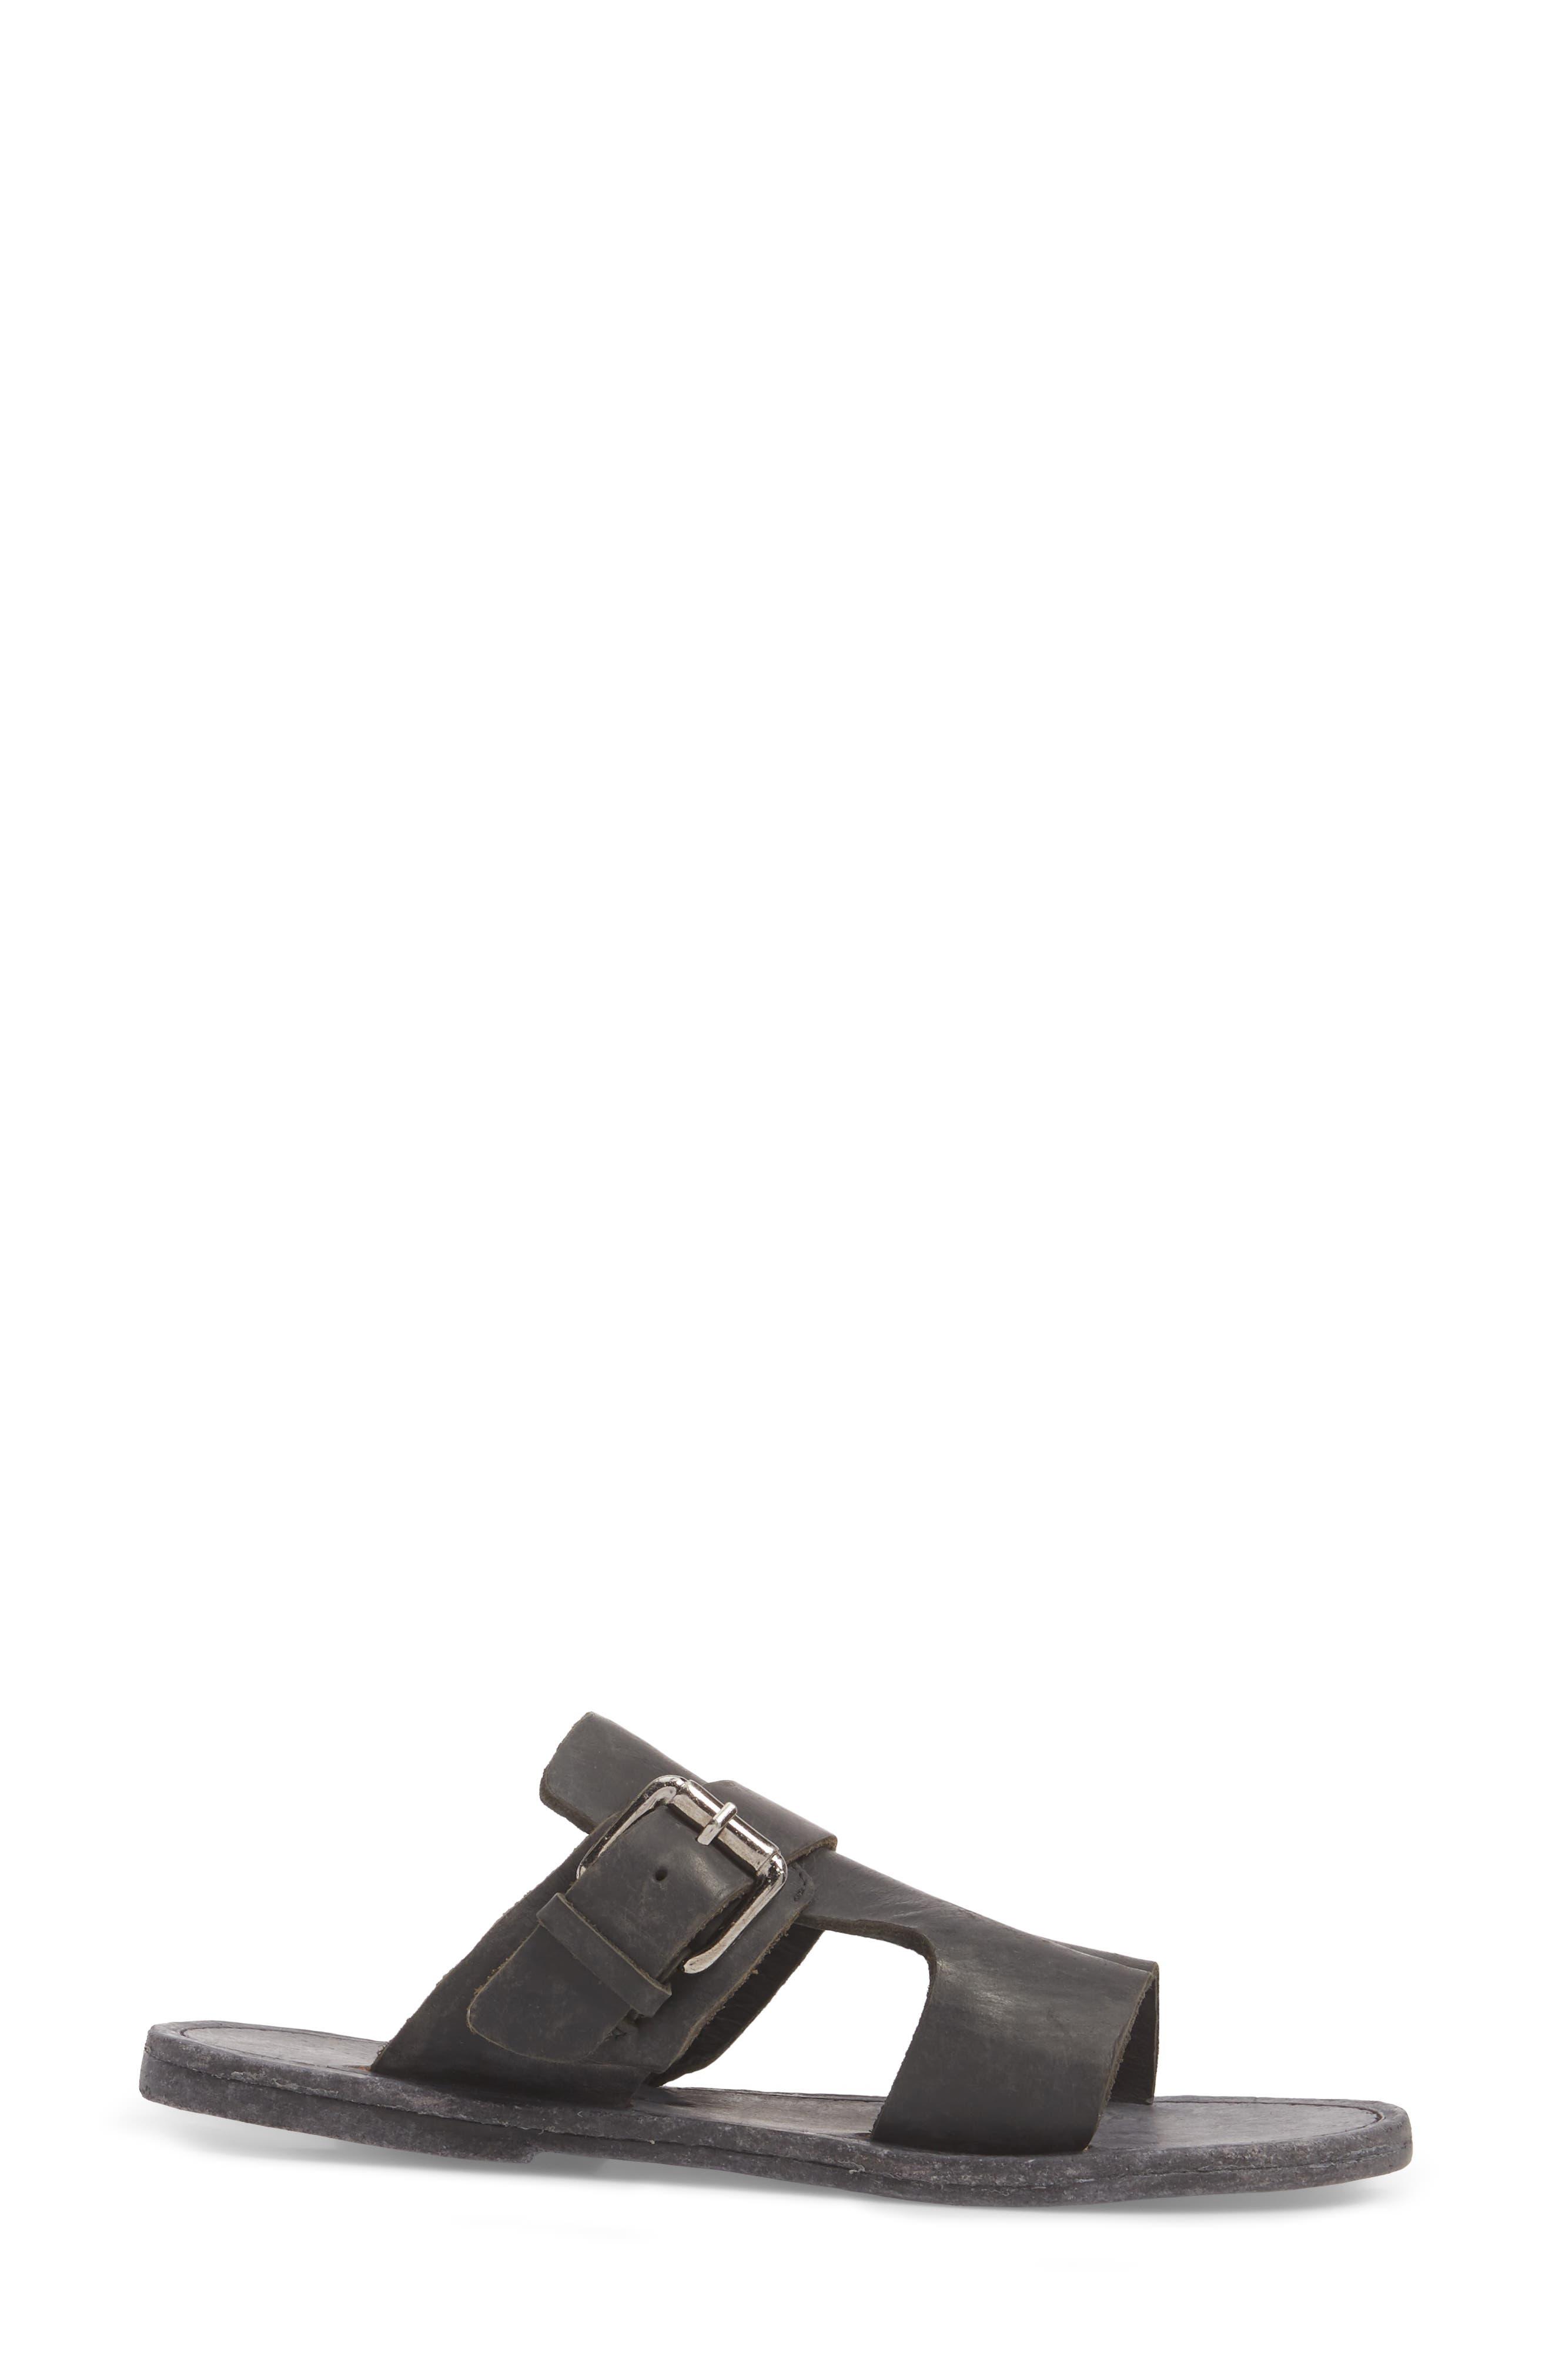 Abbie Slide Sandal,                             Alternate thumbnail 3, color,                             BLACK LEATHER